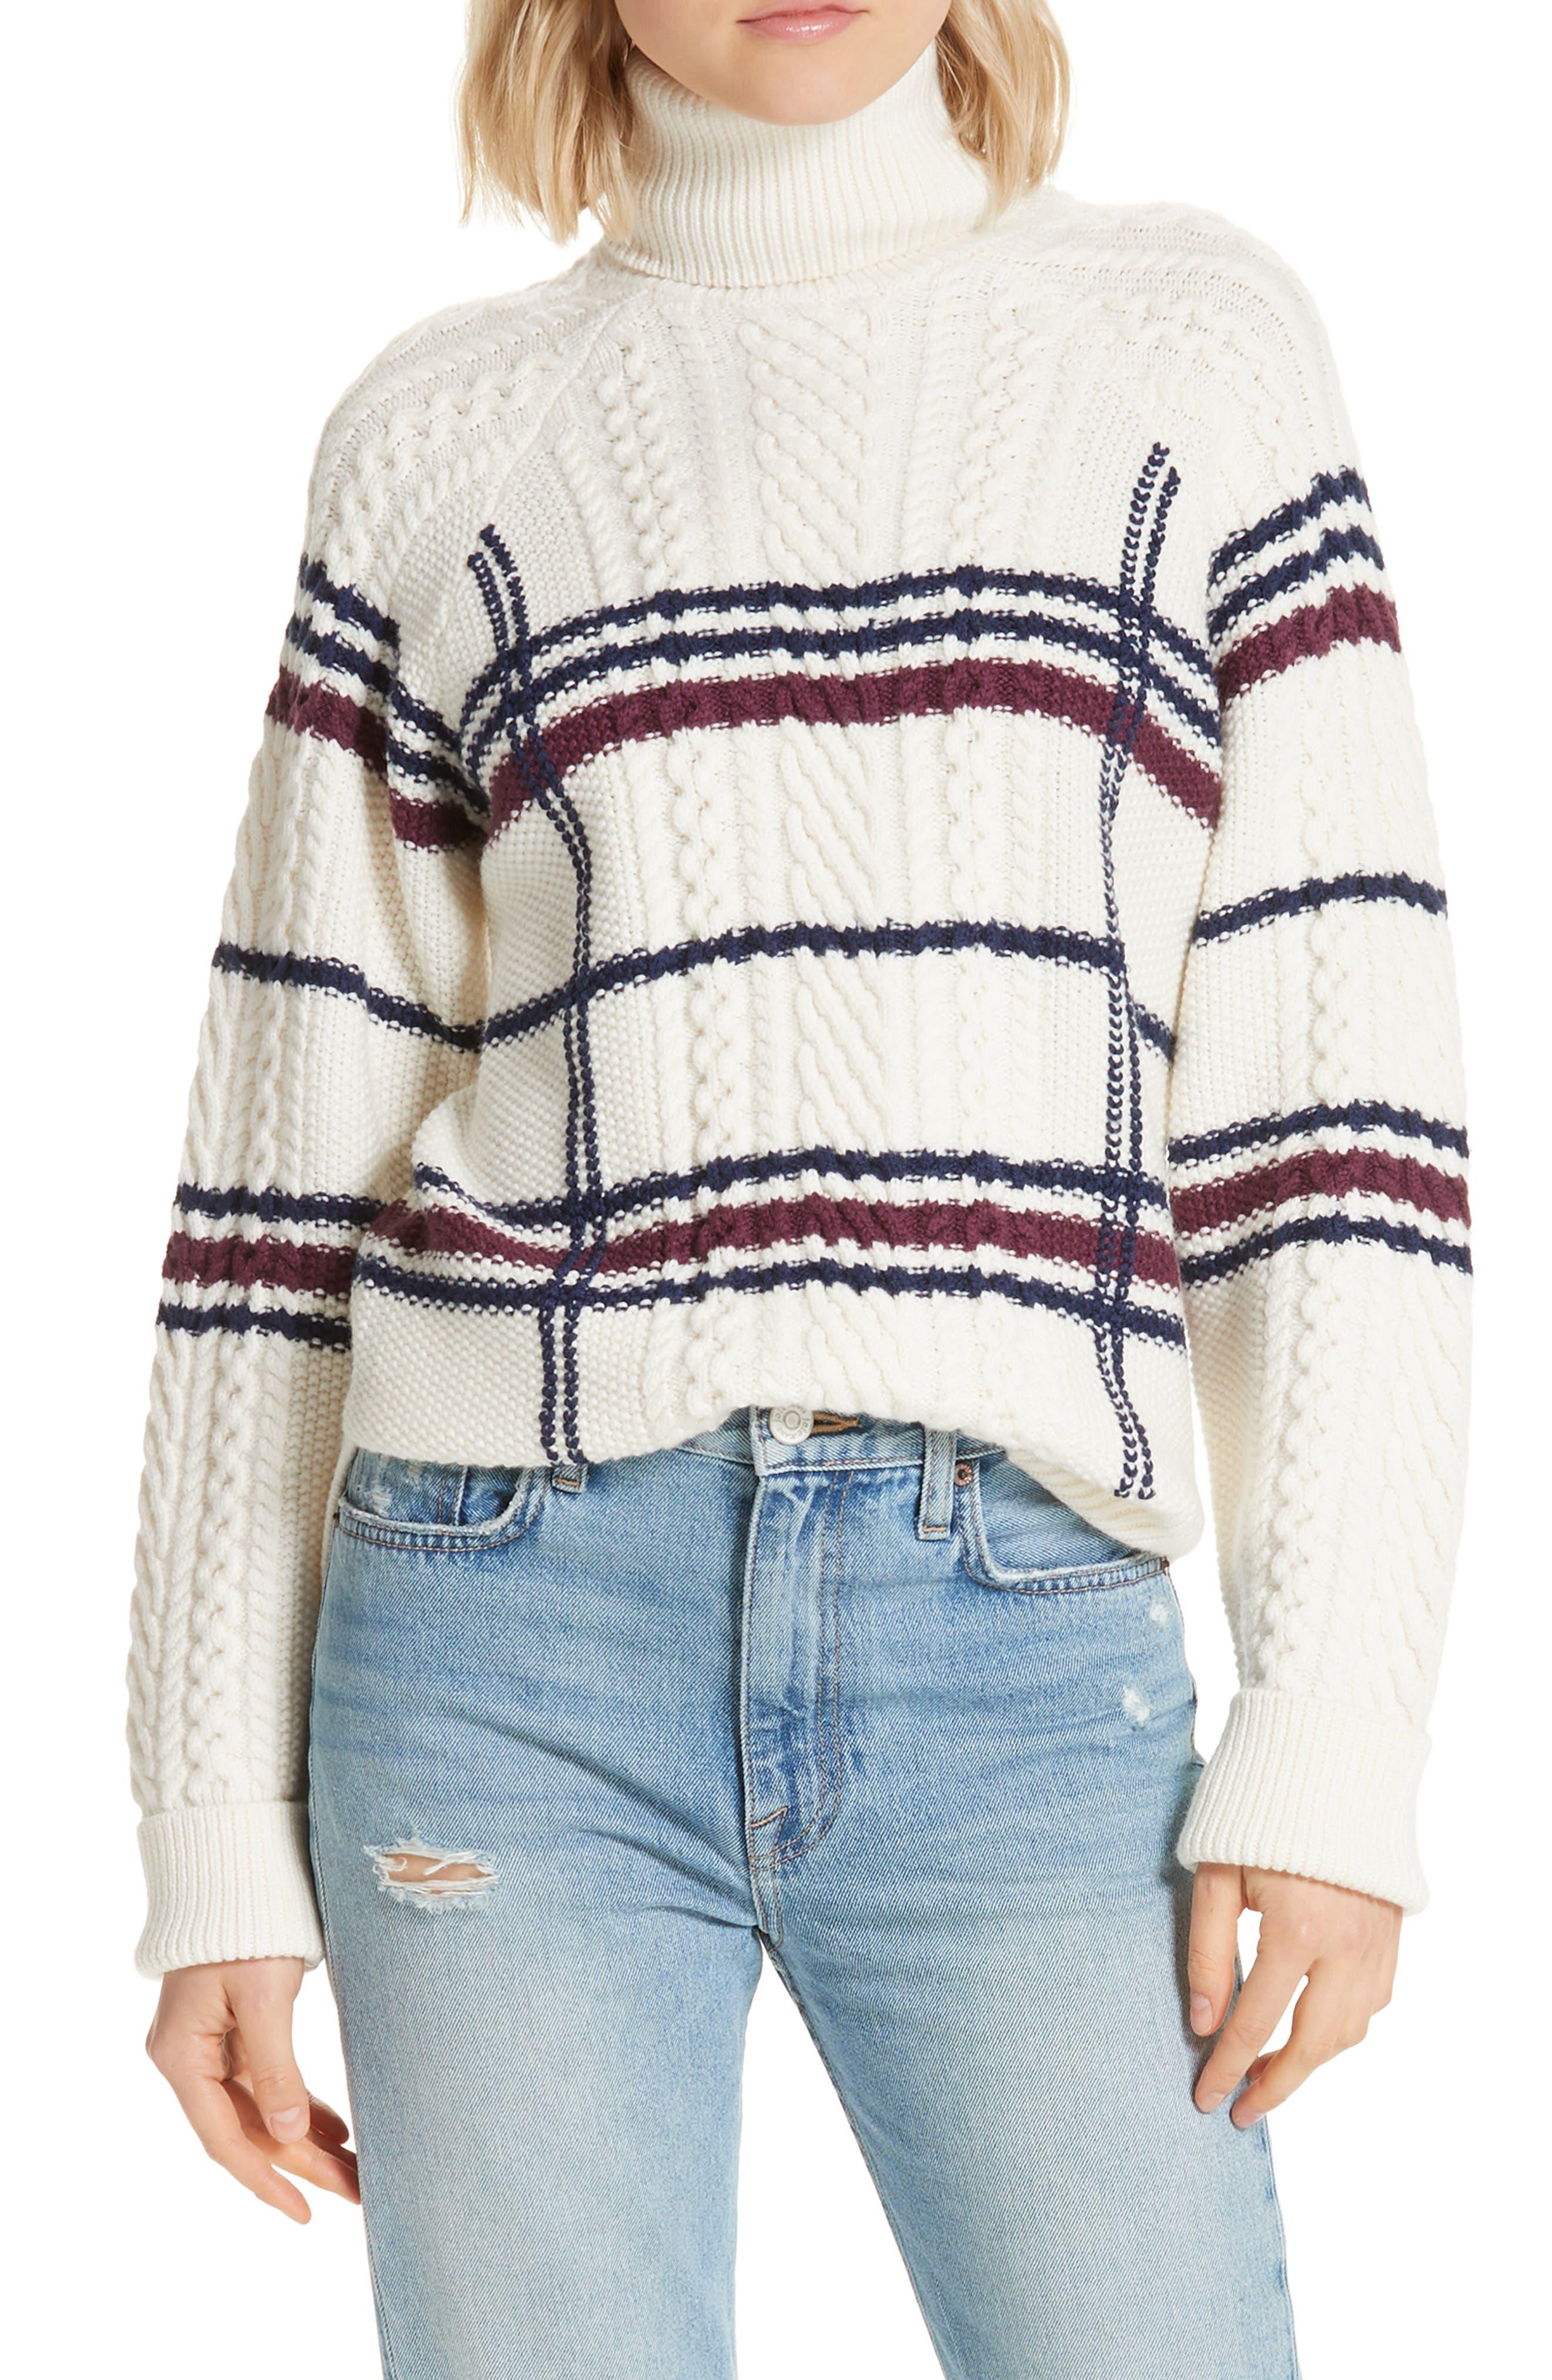 Ashlisa Sweater,                         Main,                         color, PORCELAIN